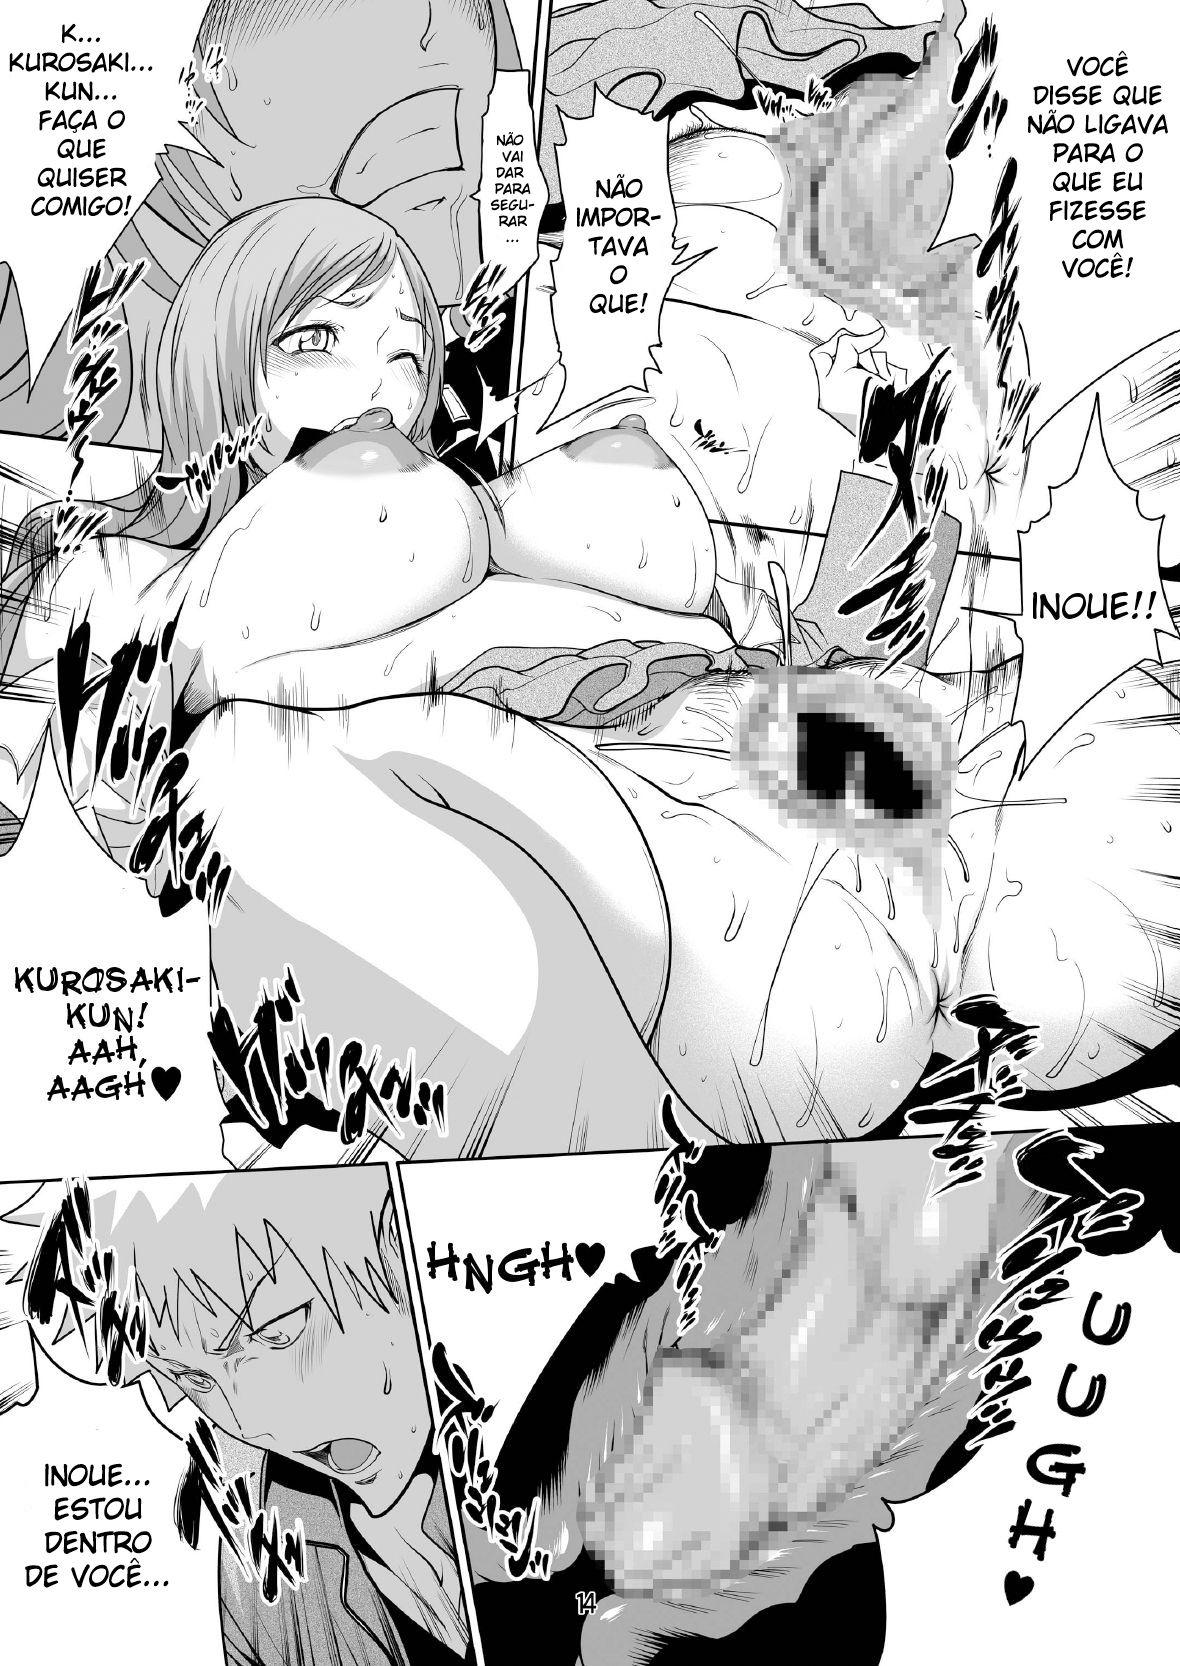 Breach-Pornô-Inoue-pervertida-12